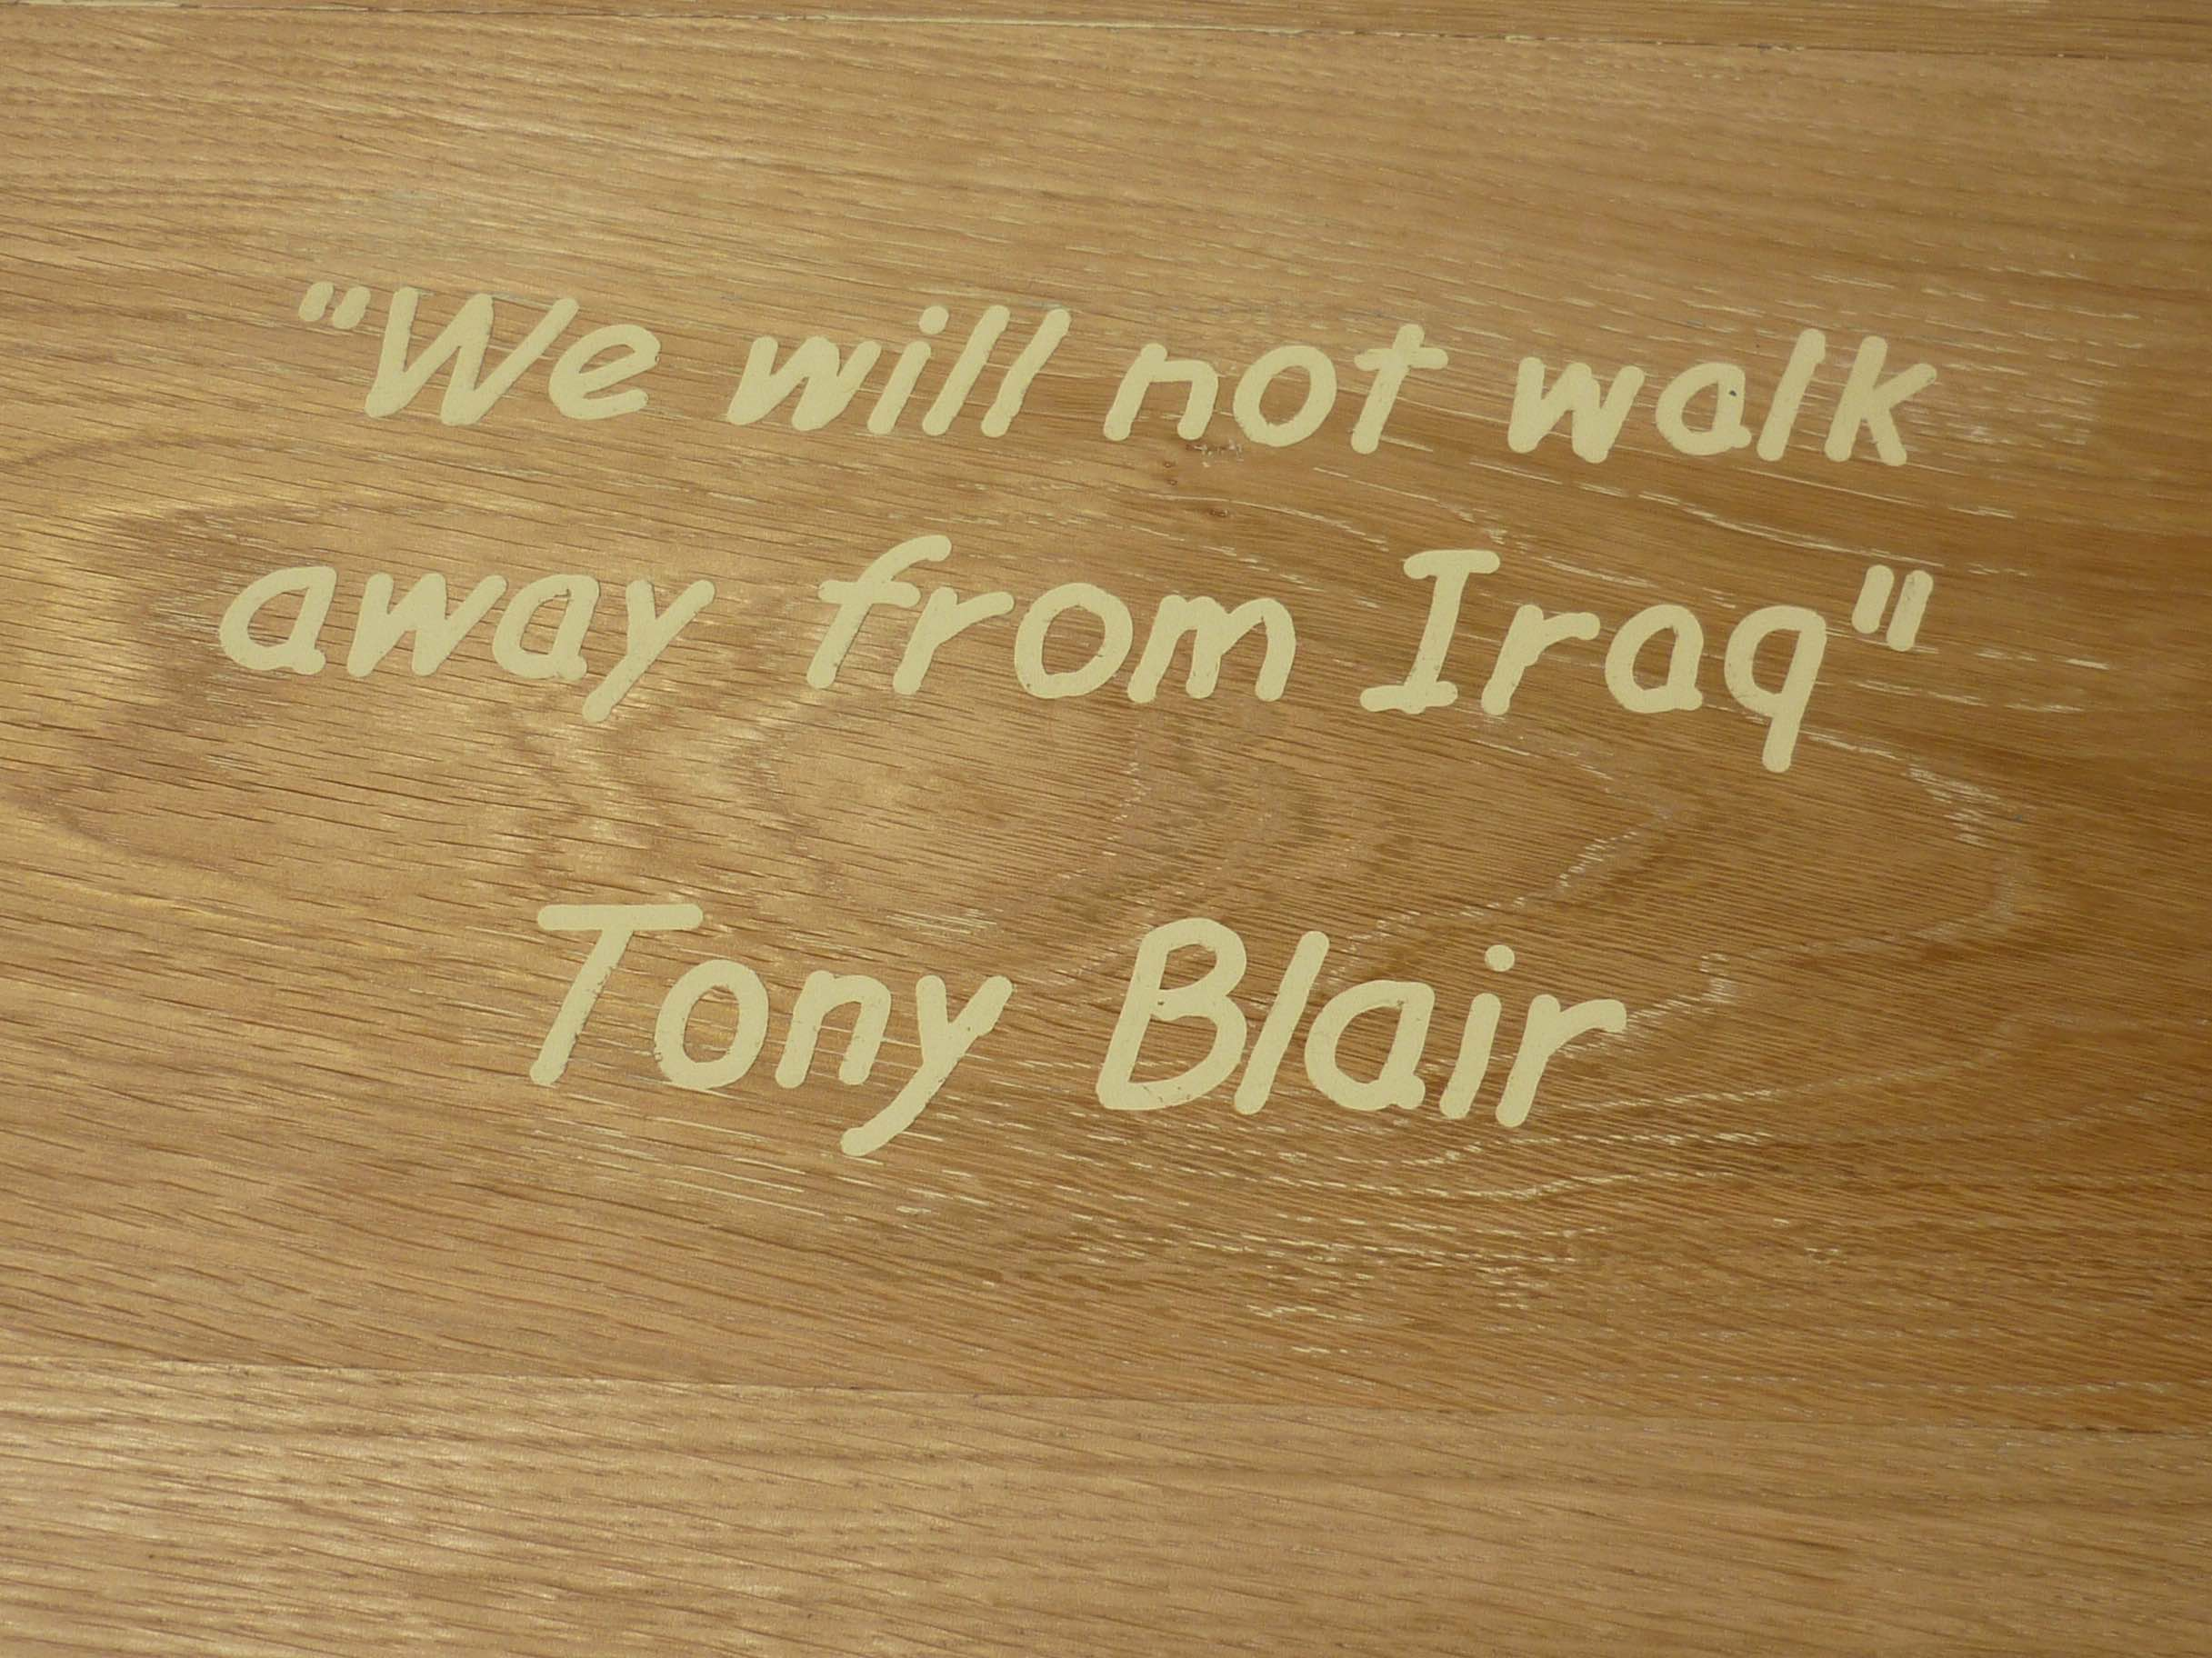 We will not walk away from Iraq - Close Up - Jeff Perks